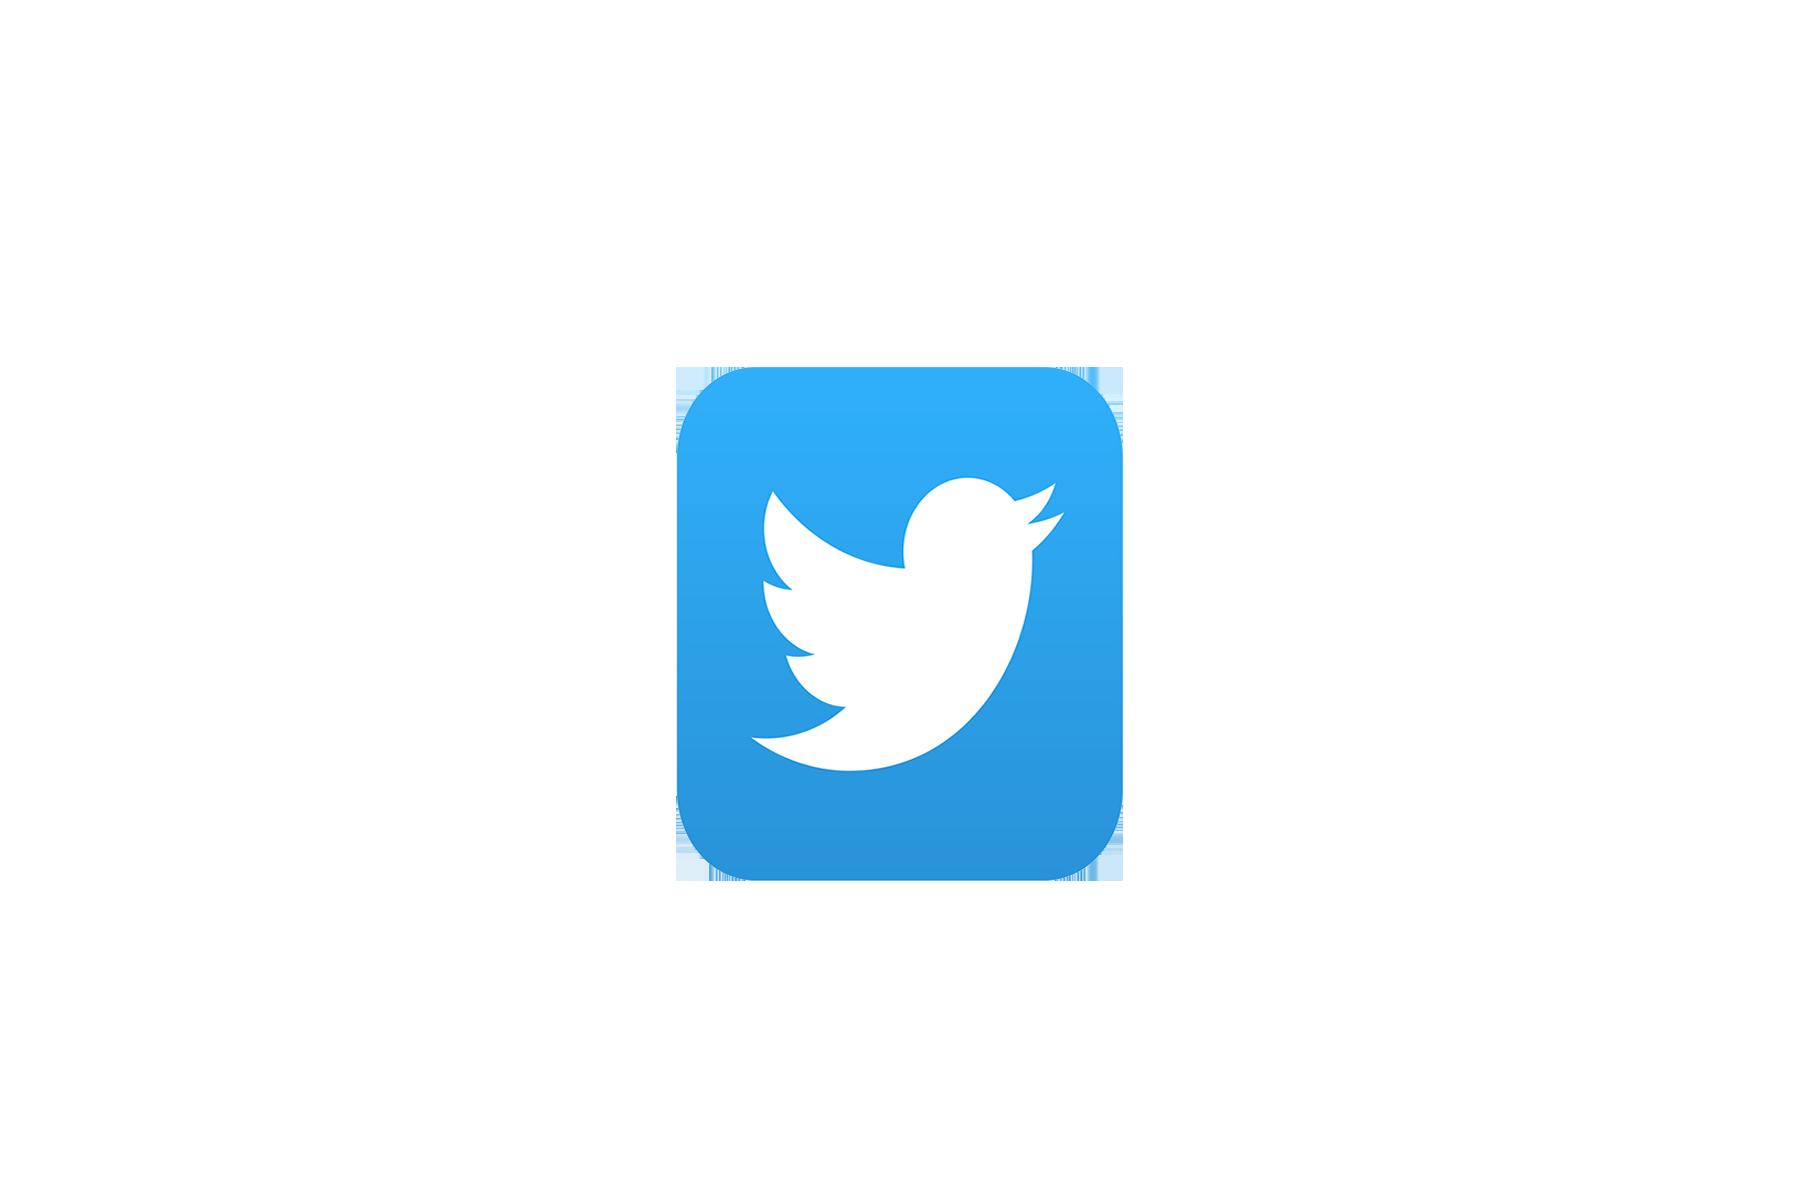 social media logo2.png